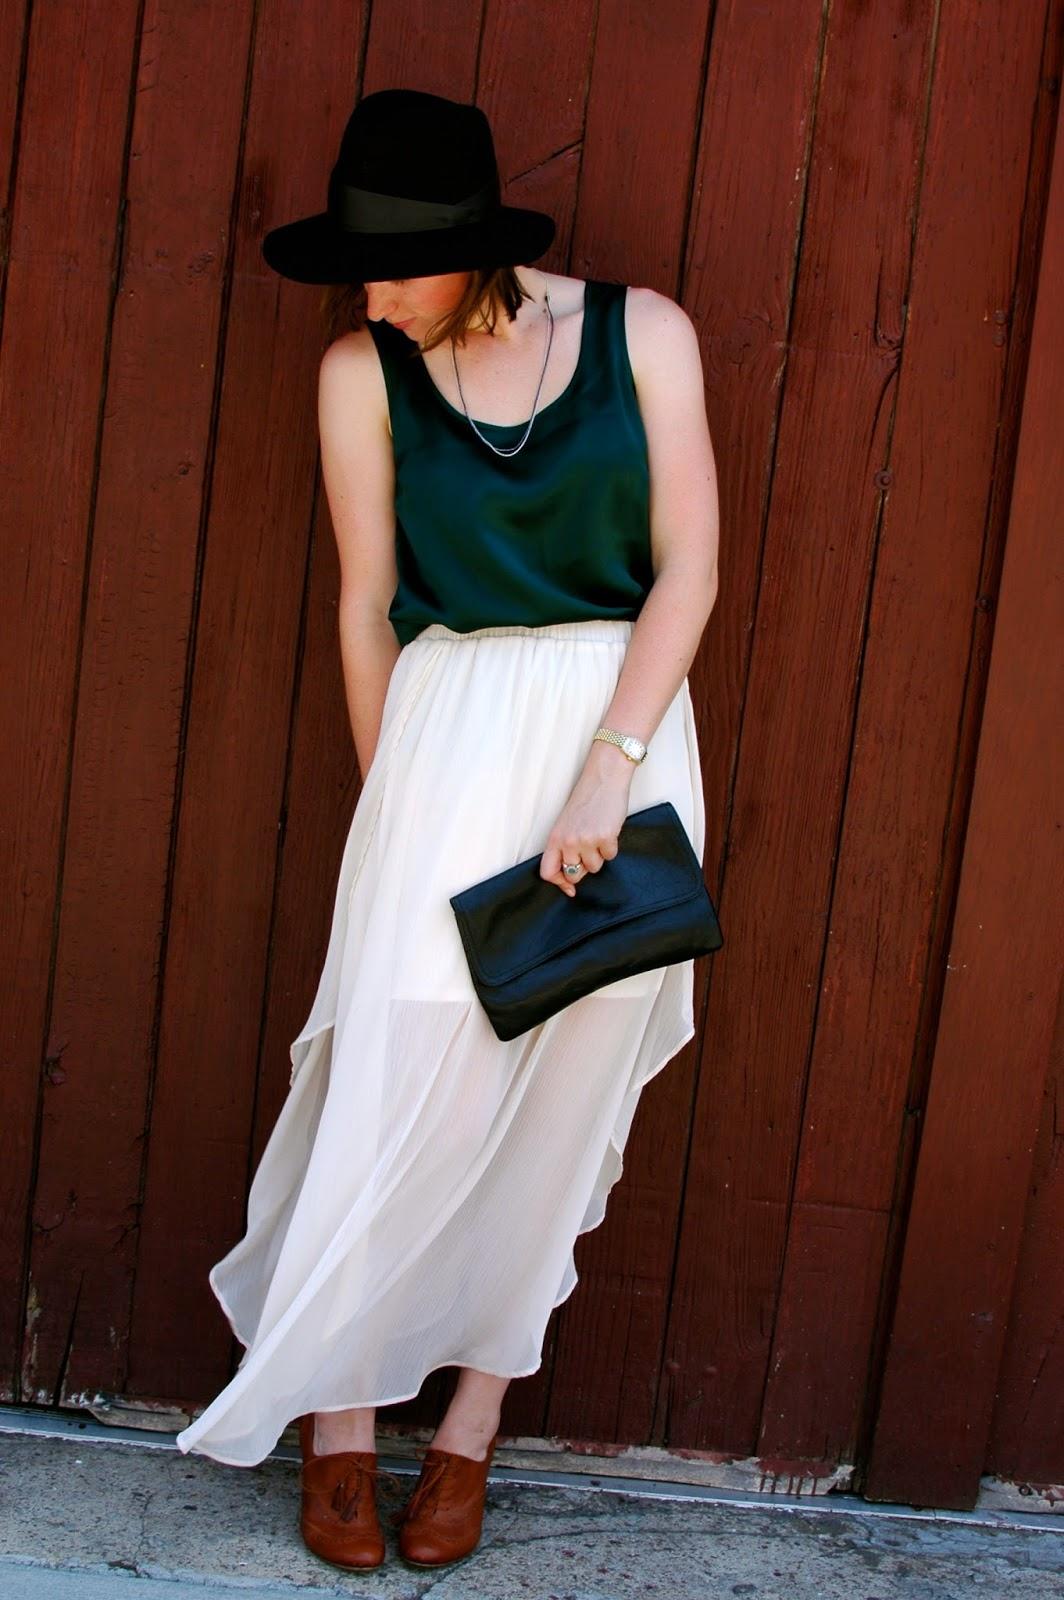 Janessa Leone Hat, Flowing Skirts, Silk Emerald top, Menswear Accessories